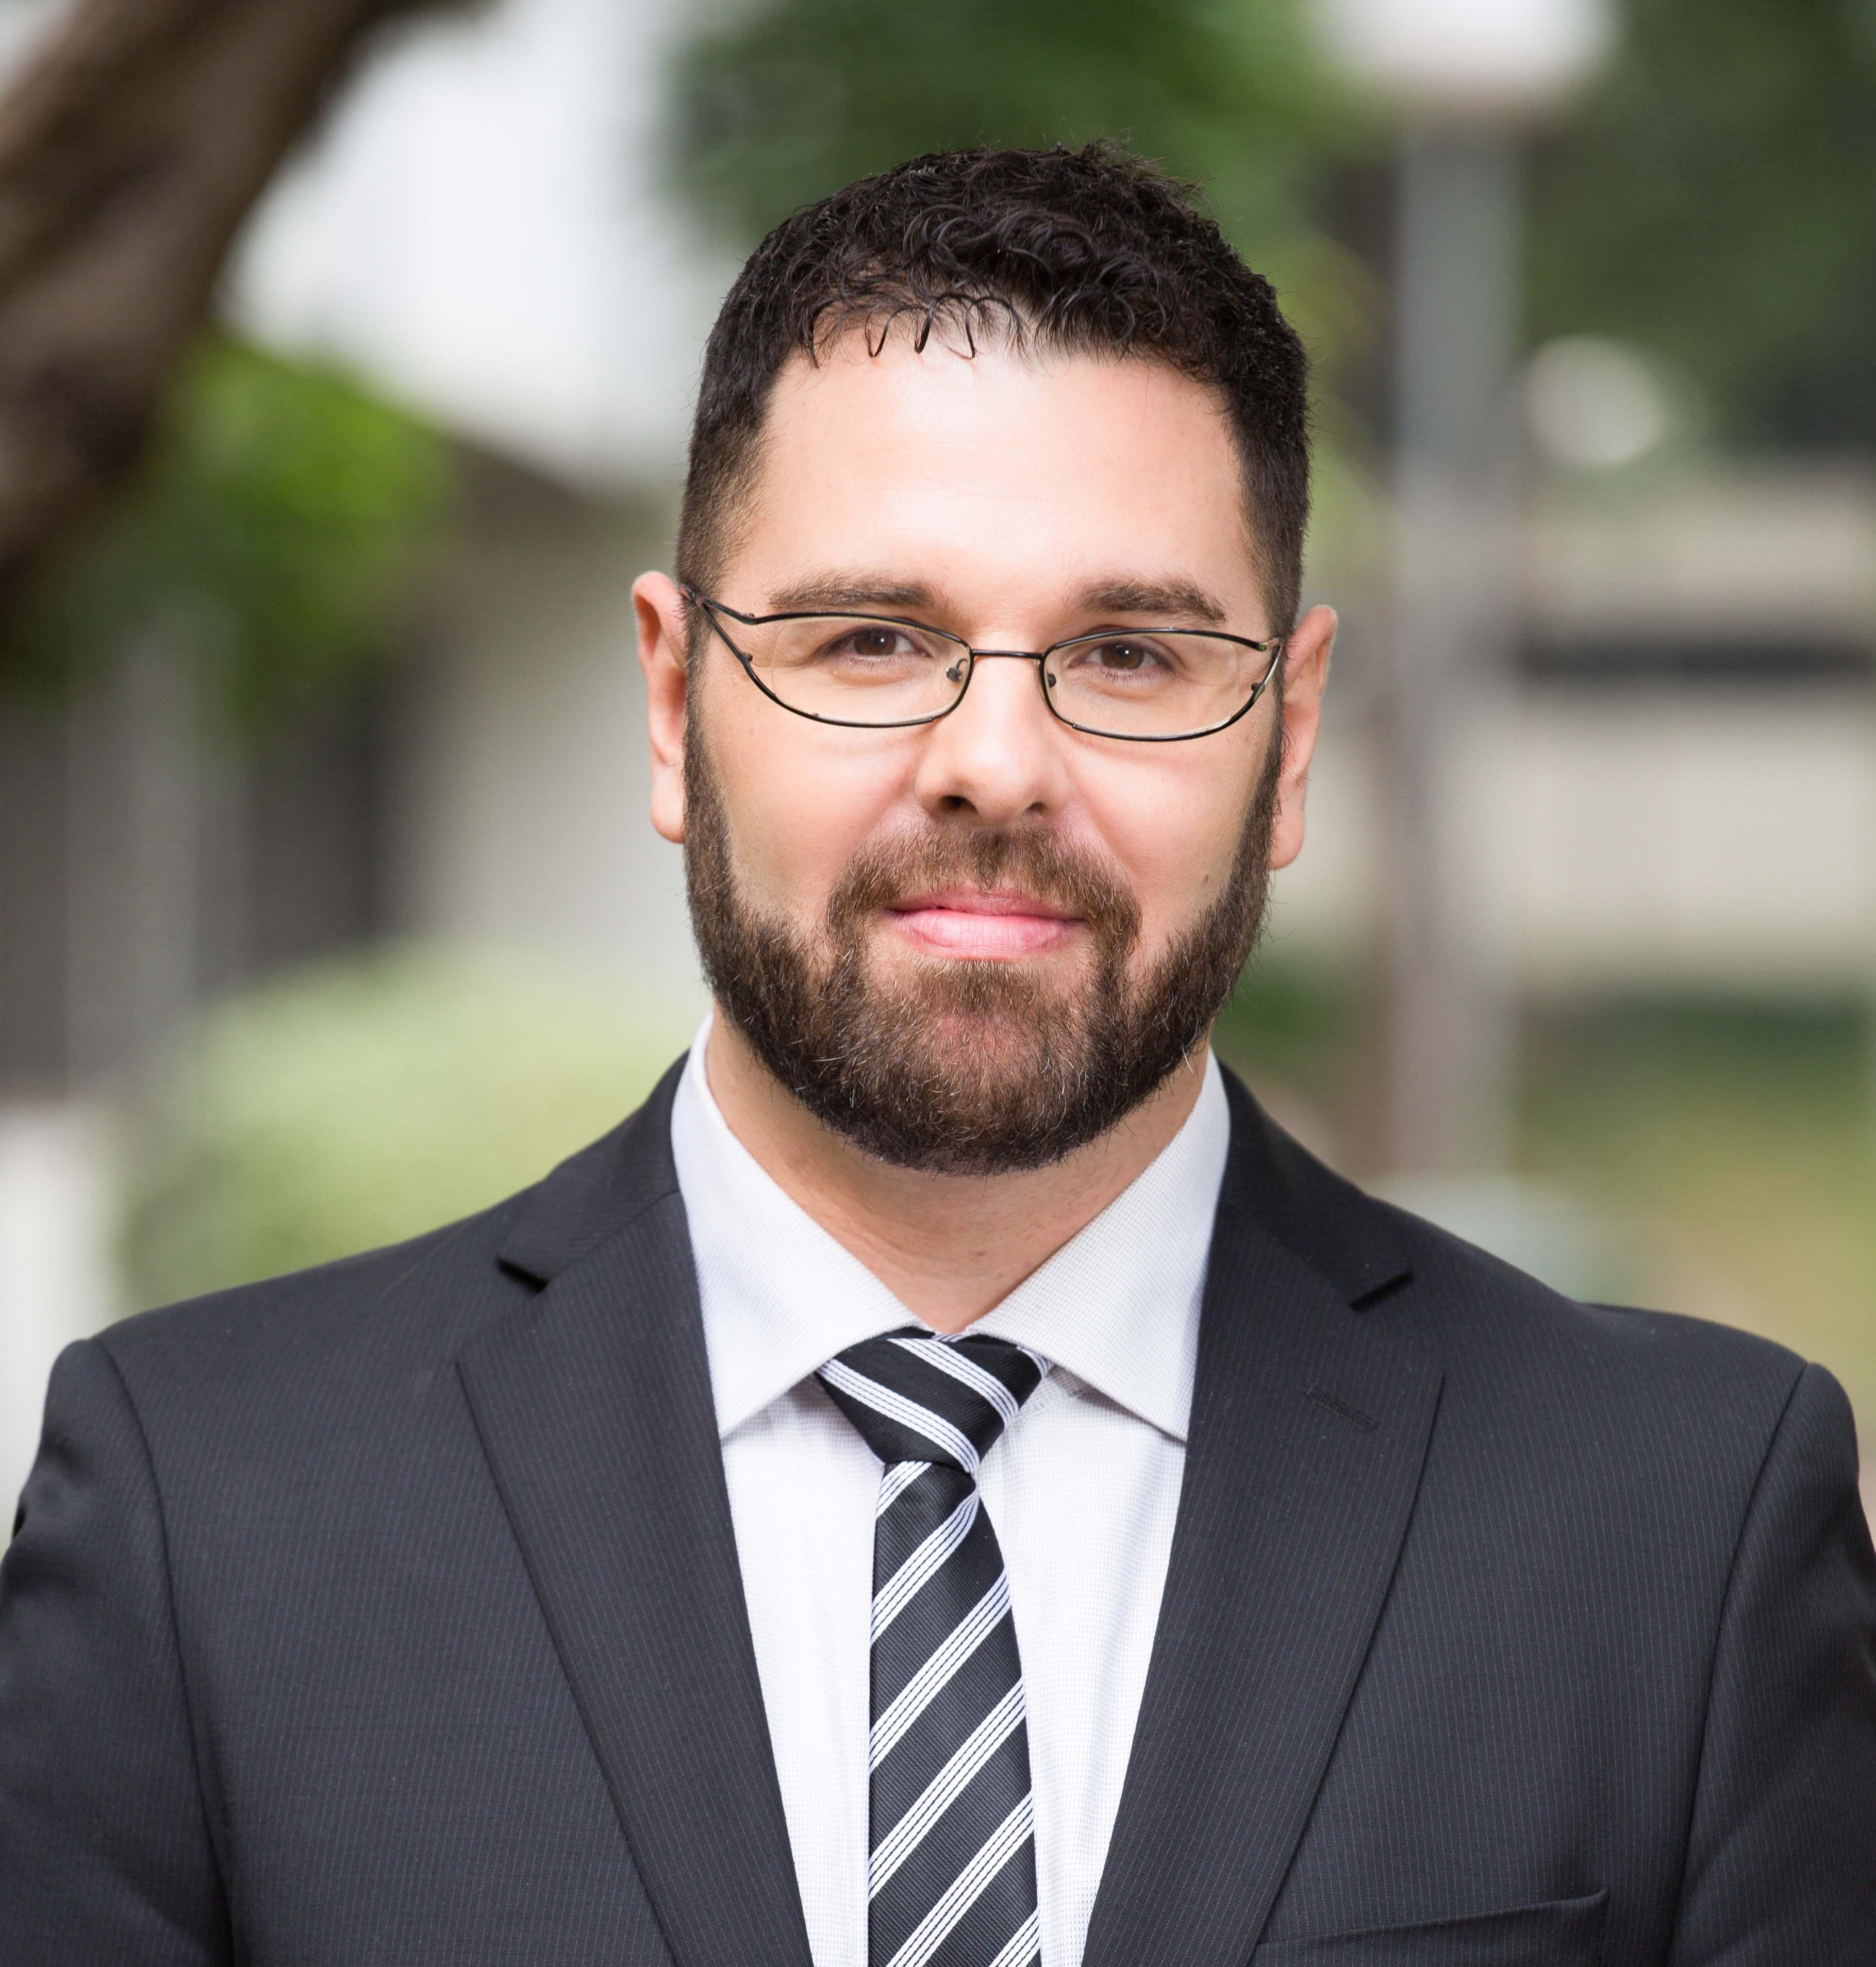 Rodrigo Grassi-Oliveira